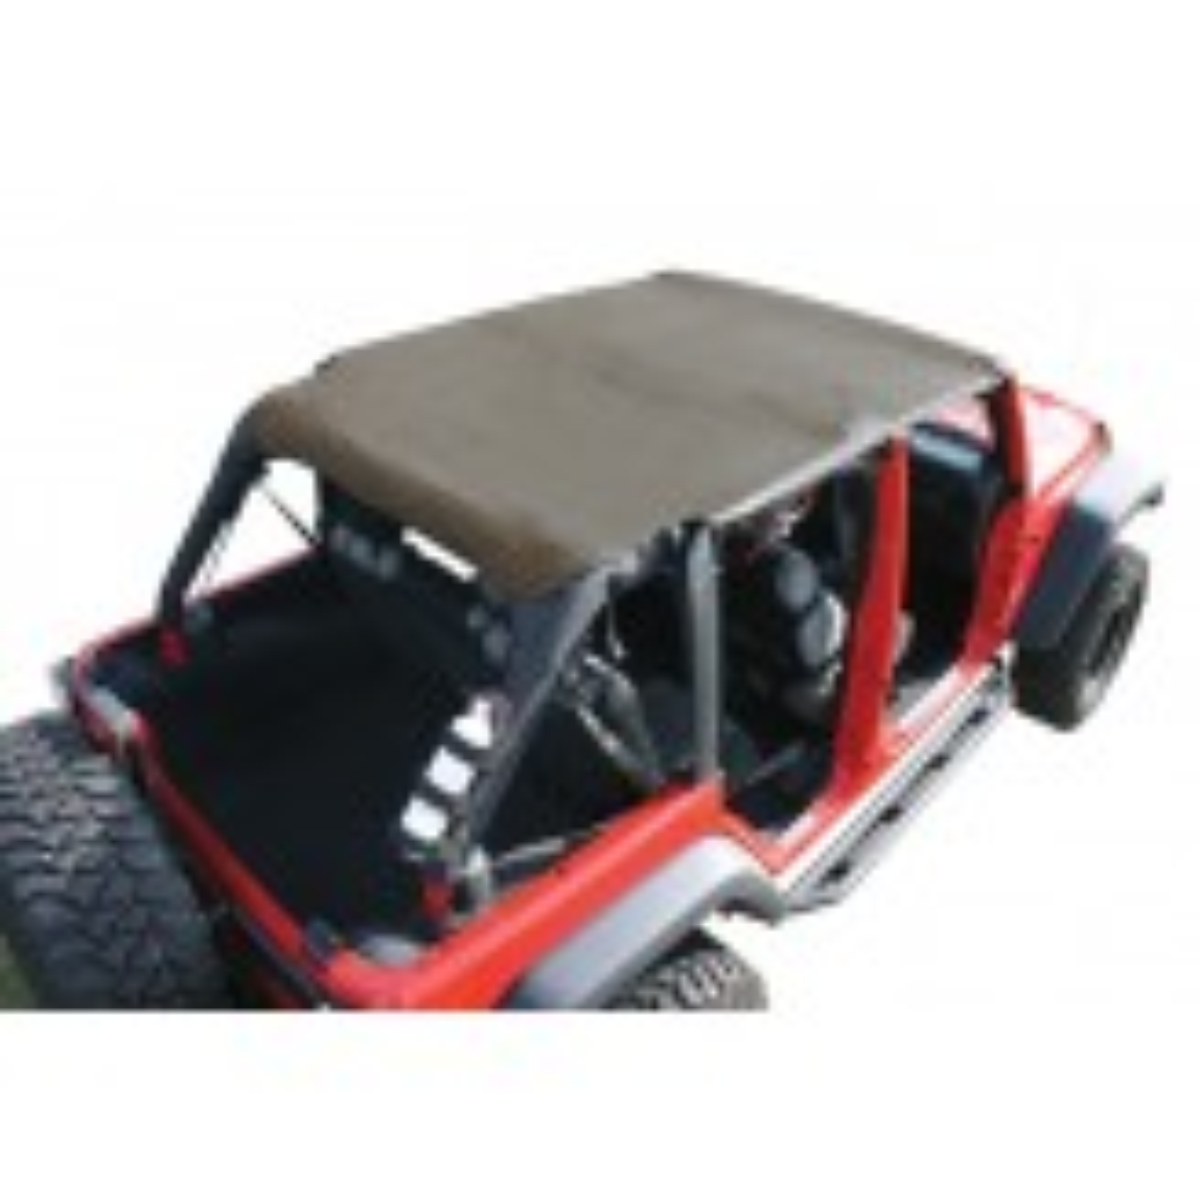 Island Pocket Topper, Khaki; 07-09 Jeep Wrangler JKU